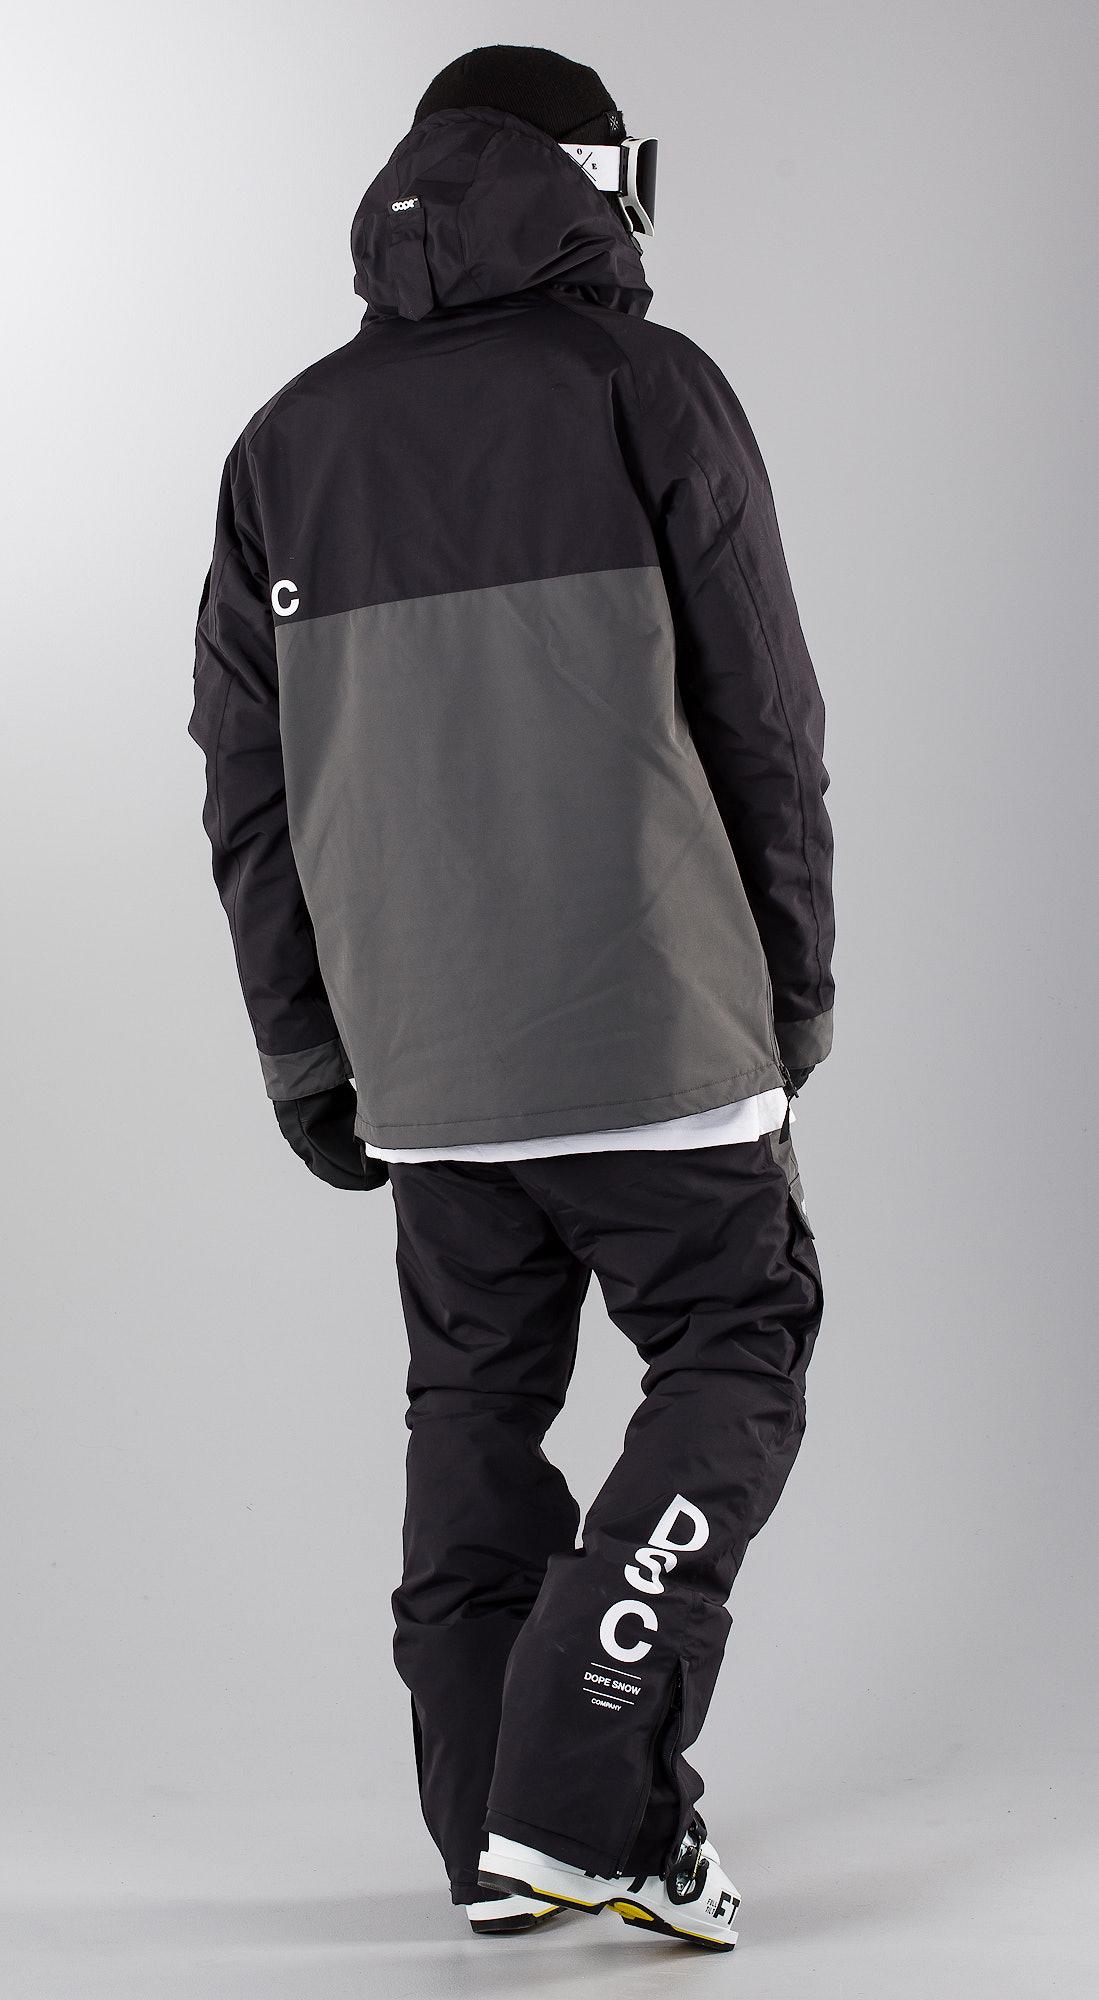 ce188f88bd0 Dope Annok DSC Black Dark Grey II Ski clothing - Ridestore